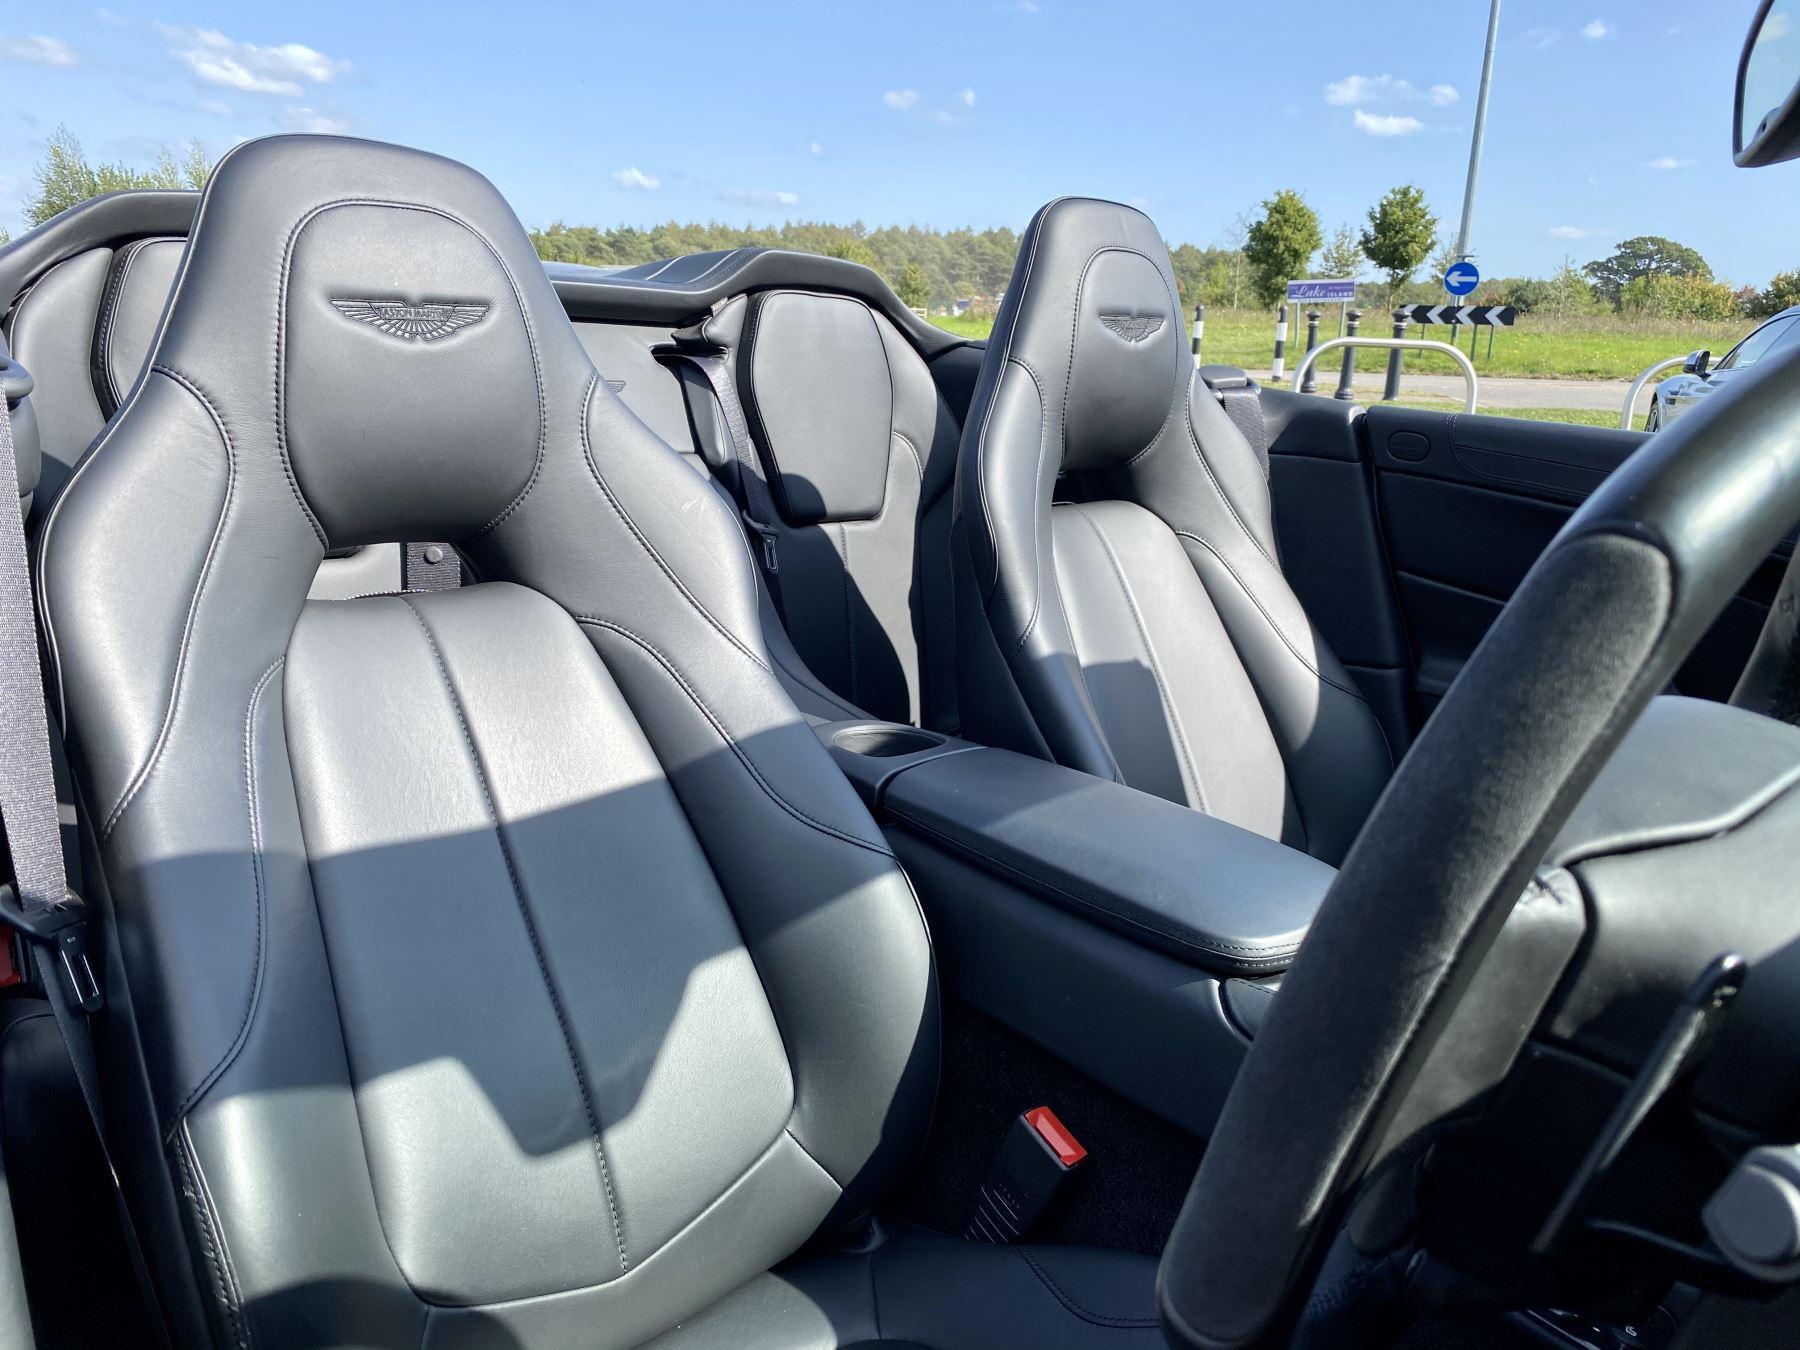 Aston Martin Vanquish V12 [595] S 2dr Volante Touchtronic image 12